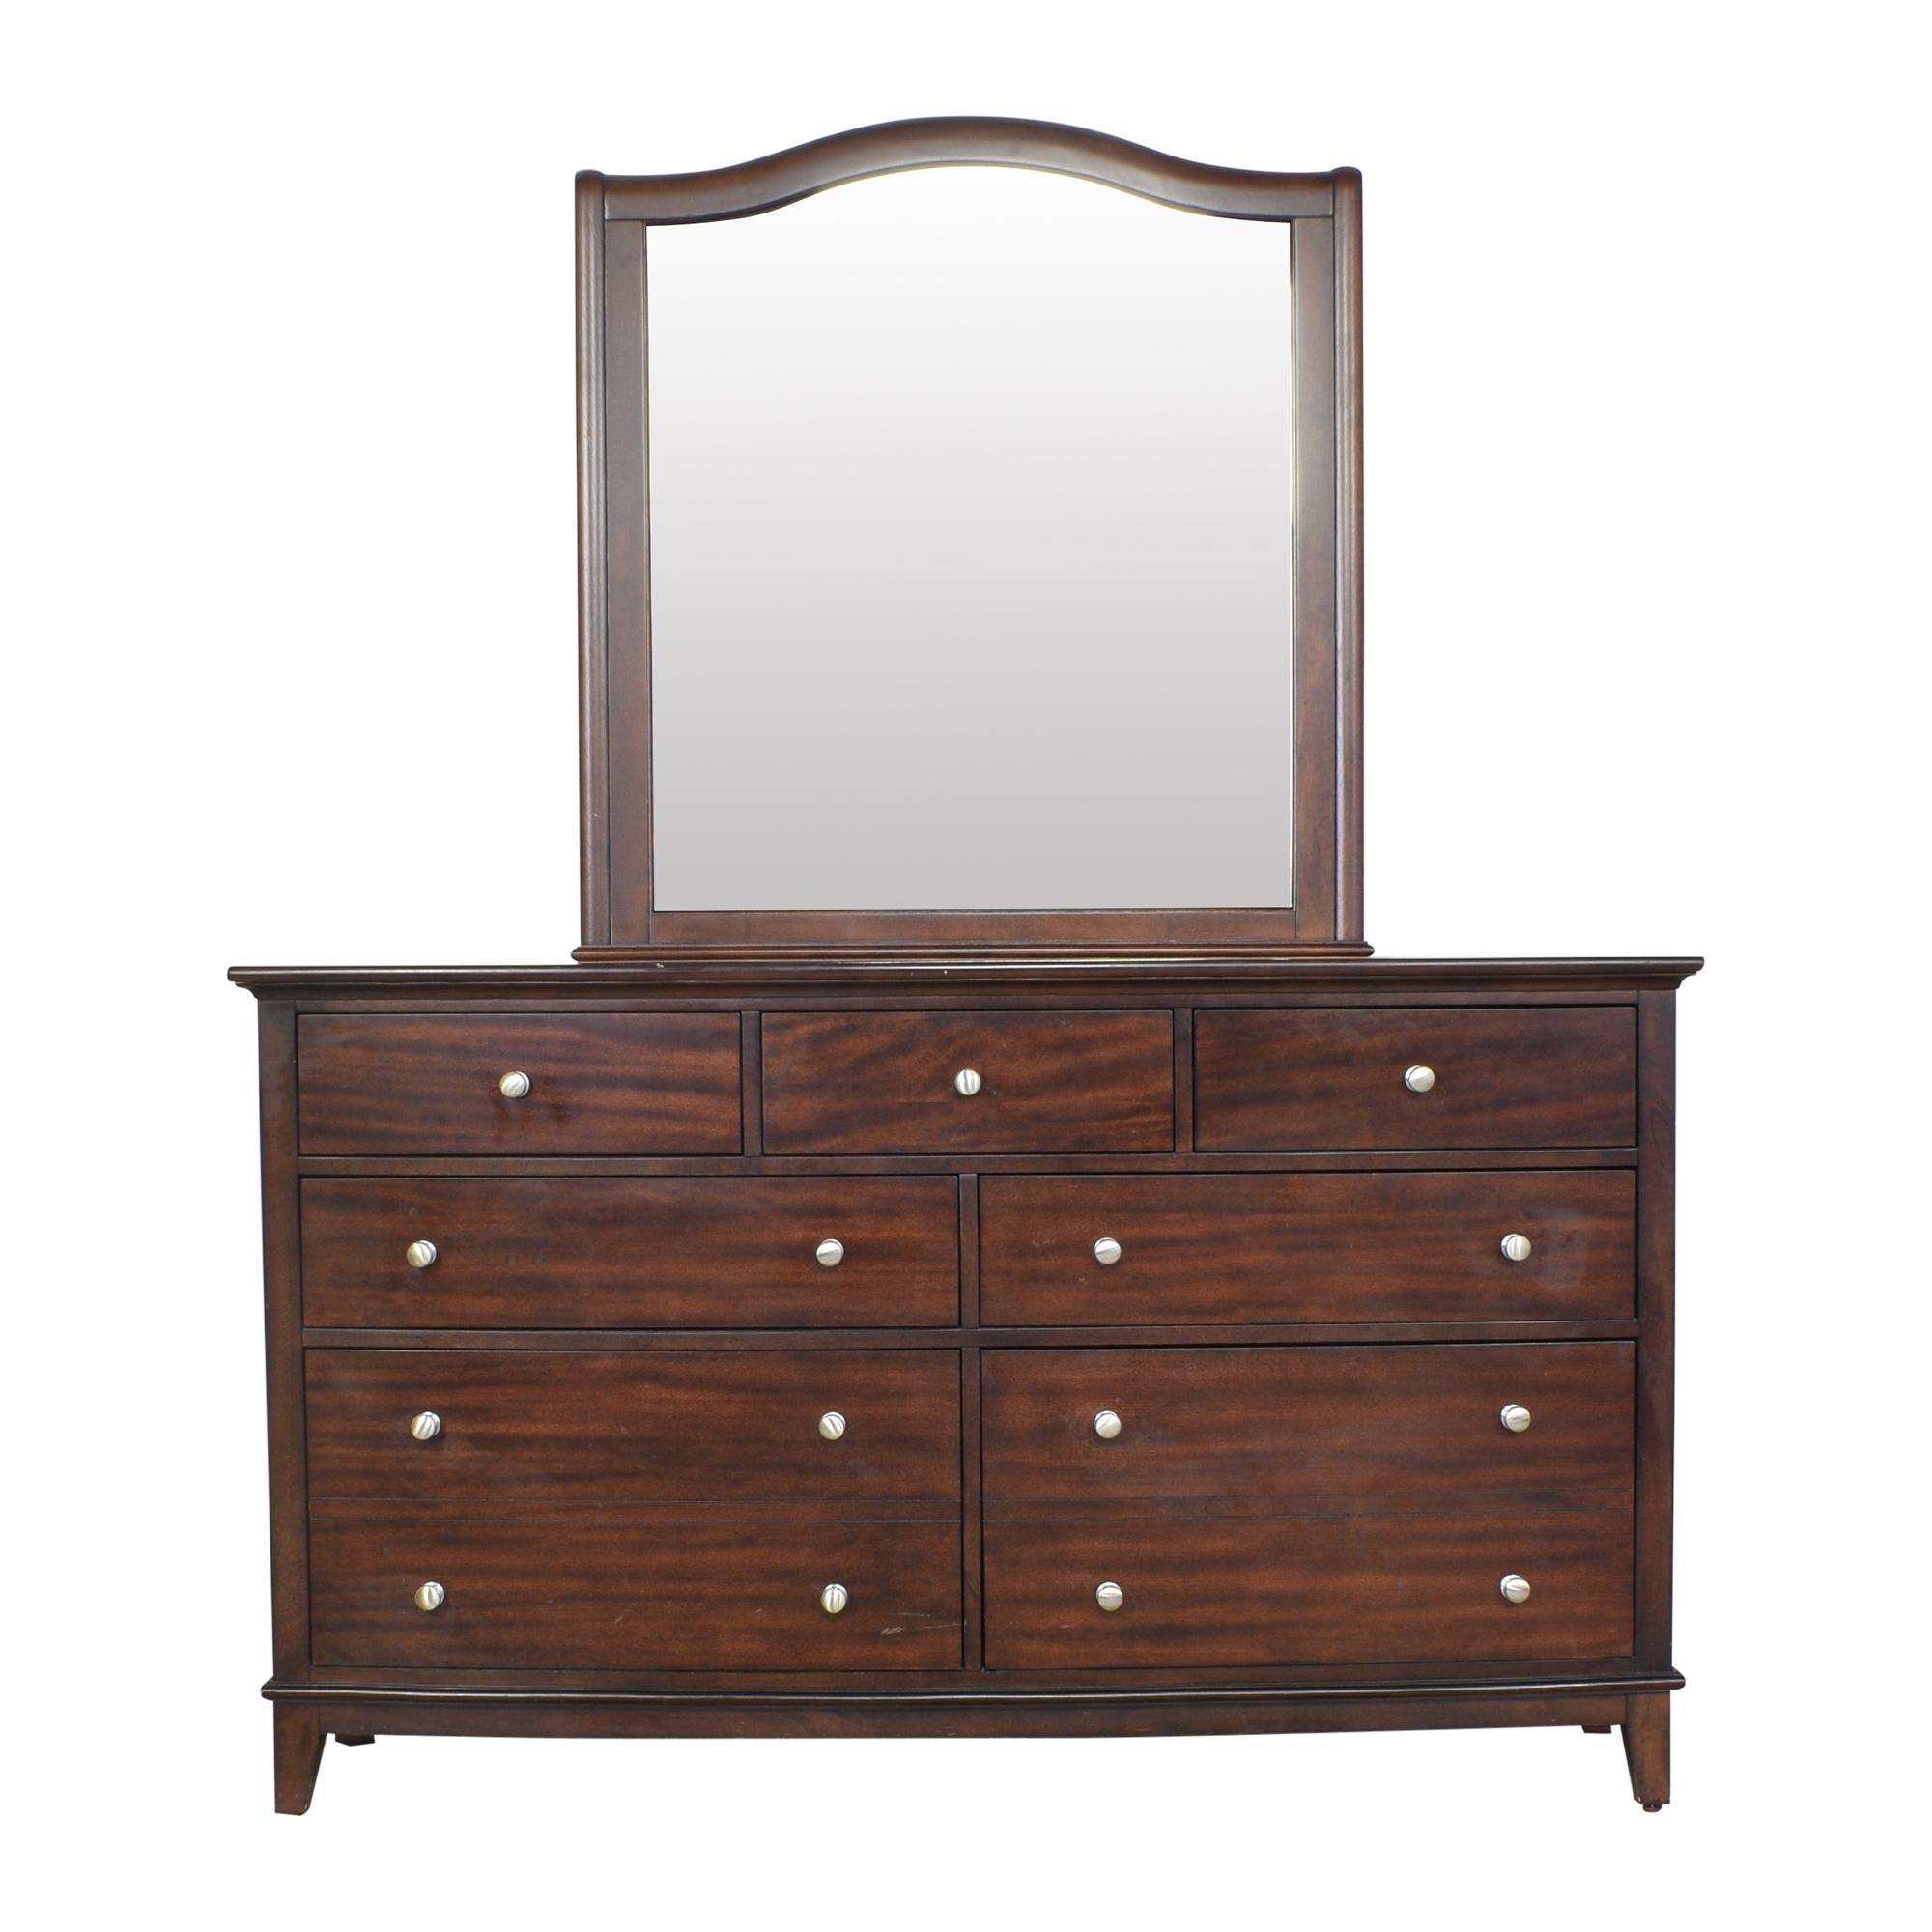 buy aspenhome Seven Drawer Dresser with Mirror aspenhome Dressers